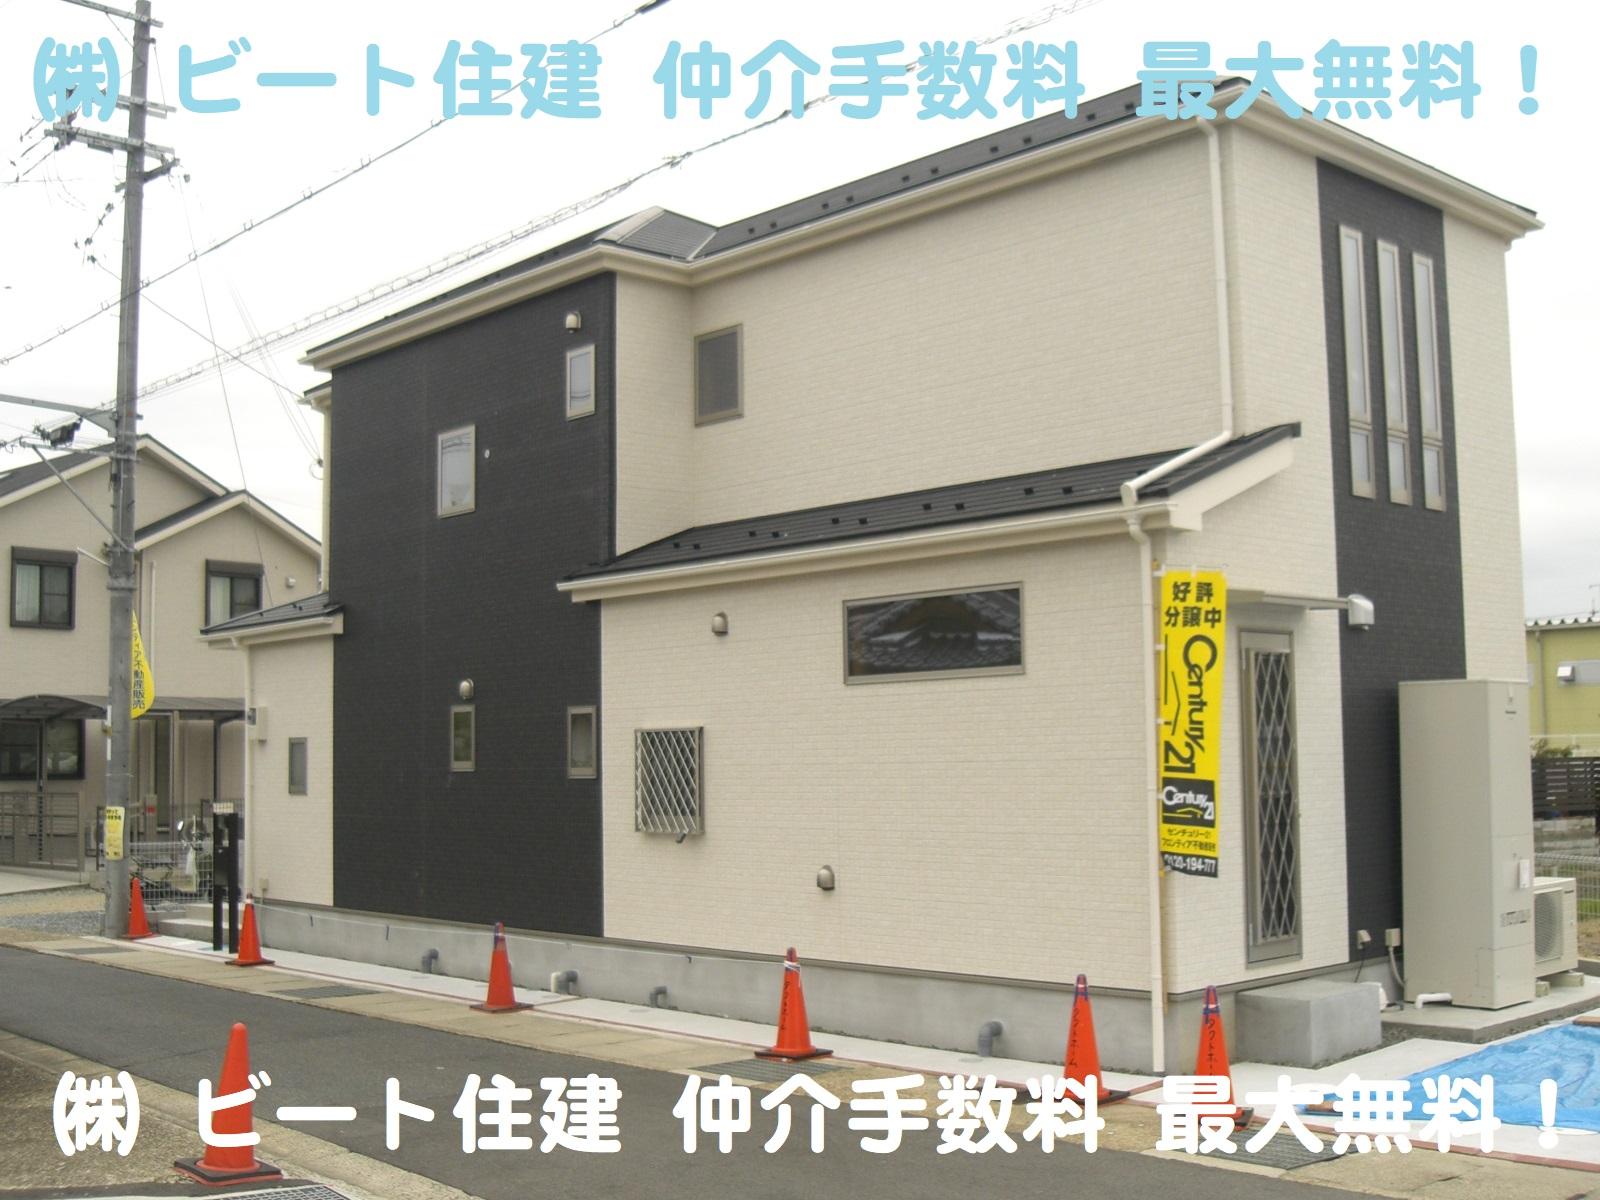 奈良県 新築 ビート住建 斑鳩町 お買い得 仲介手数料 最大無料